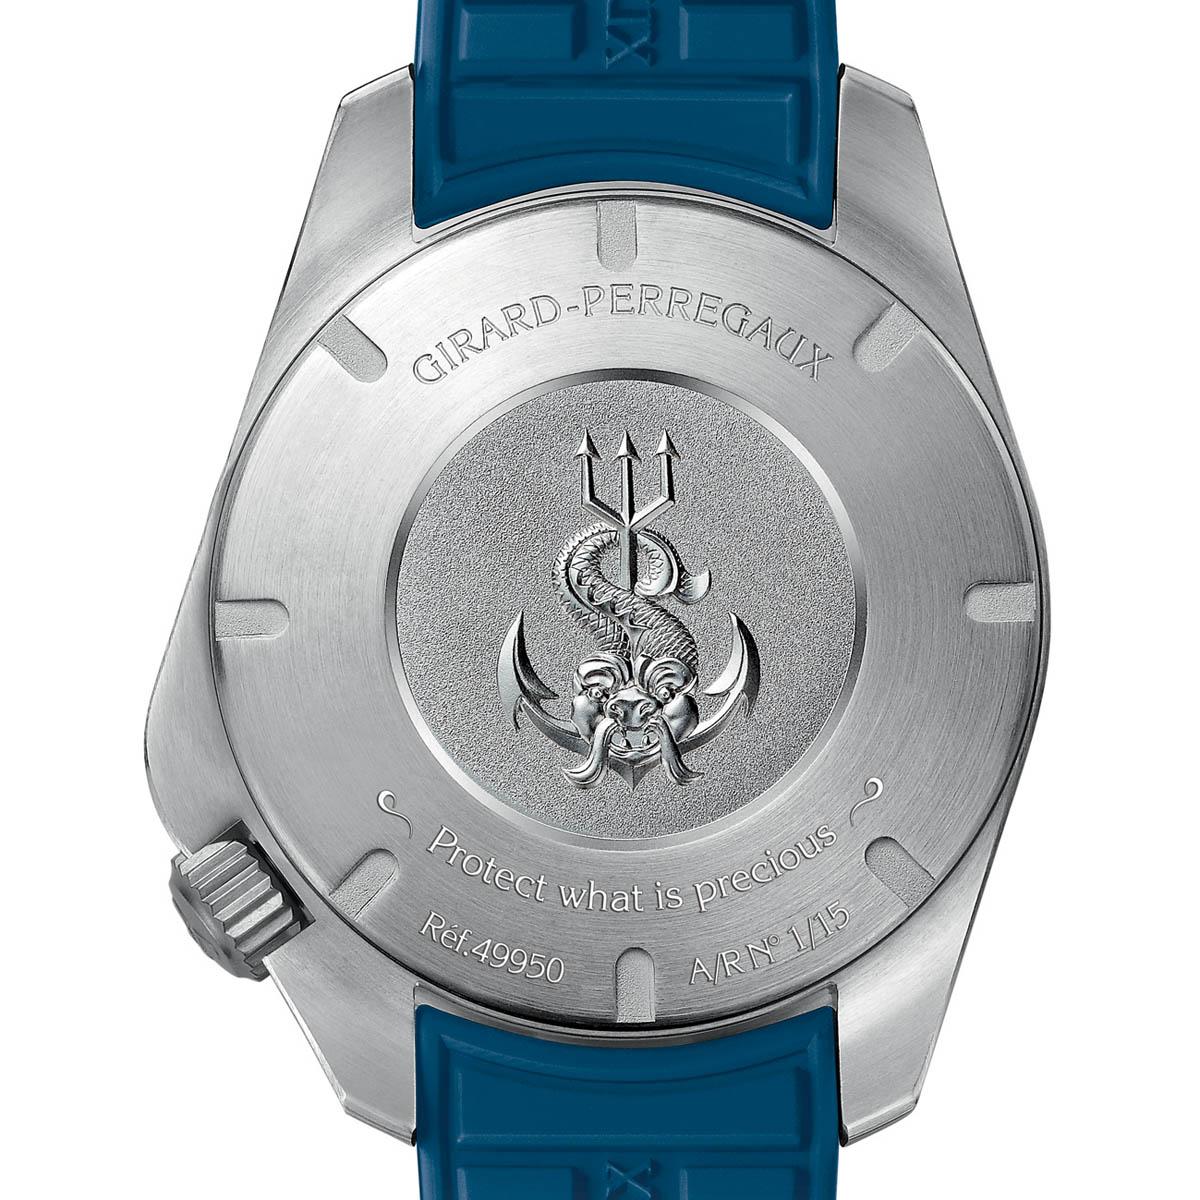 "The Watch Quote: Photo - Girard-Perregaux Sea Hawk Pro 1000  ""Big Blue�"